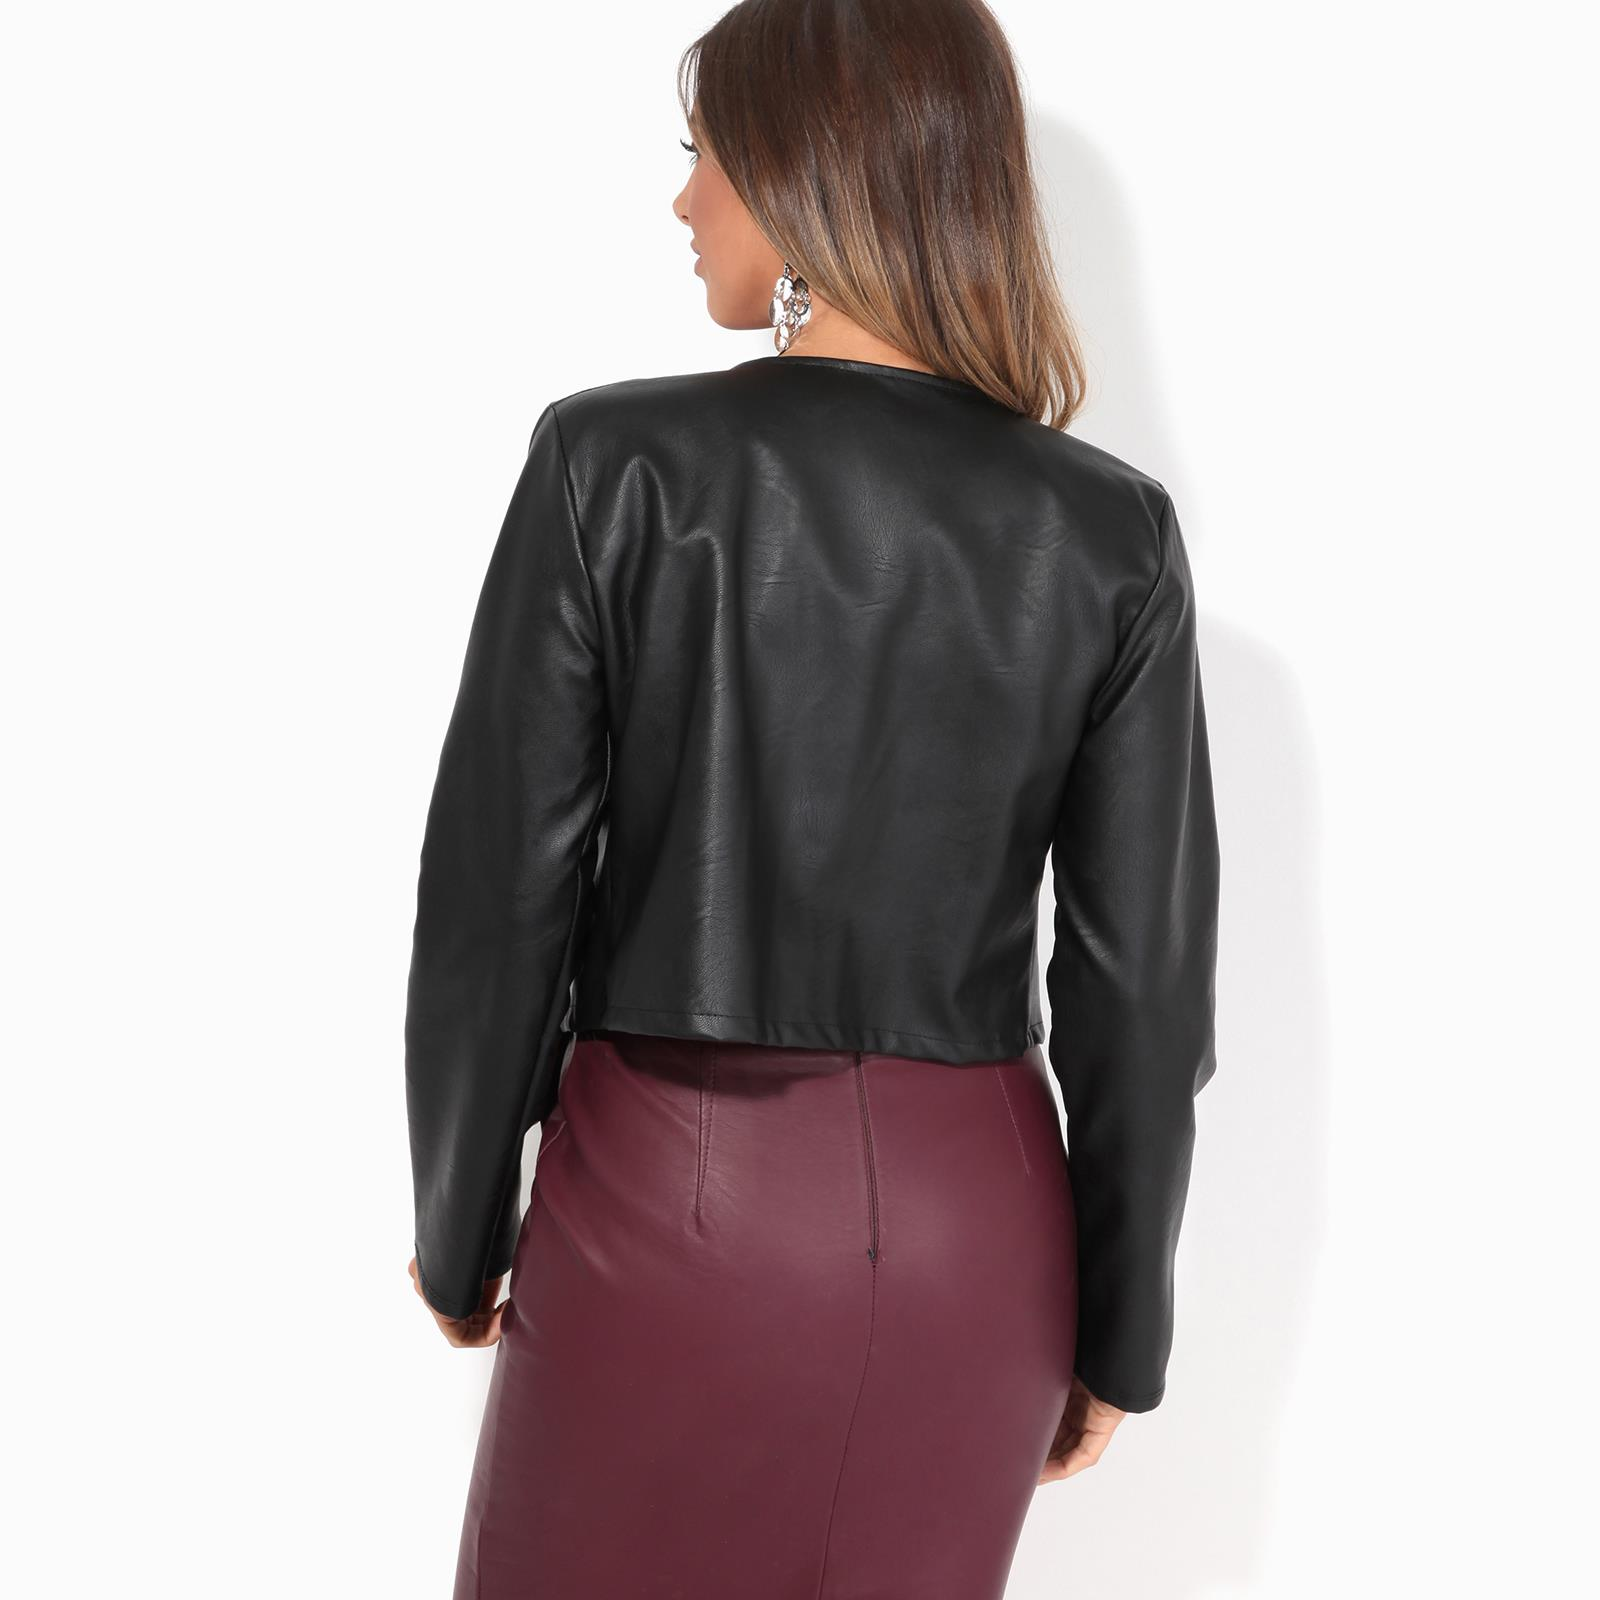 Womens-Ladies-PU-Leather-Biker-Jacket-Open-Bolero-Short-Coat-Shrug-Cropped-Top thumbnail 3